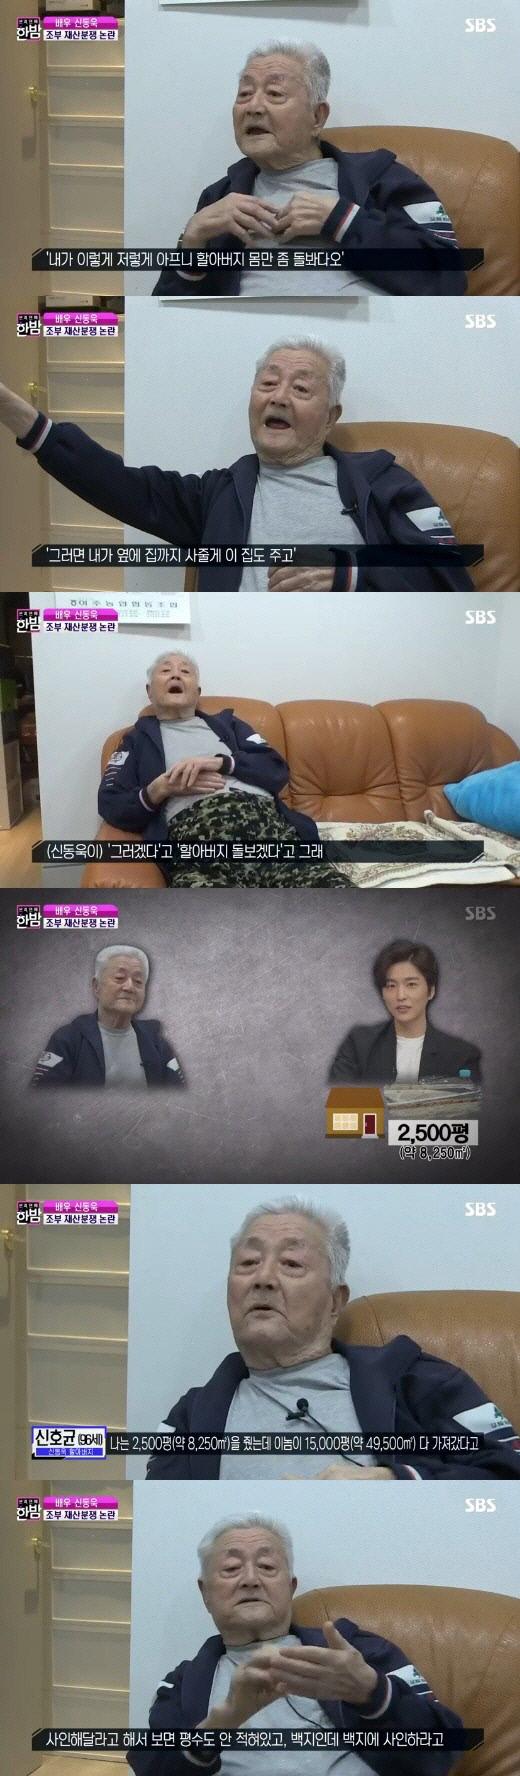 SBS '본격 한밤연예' 캡처